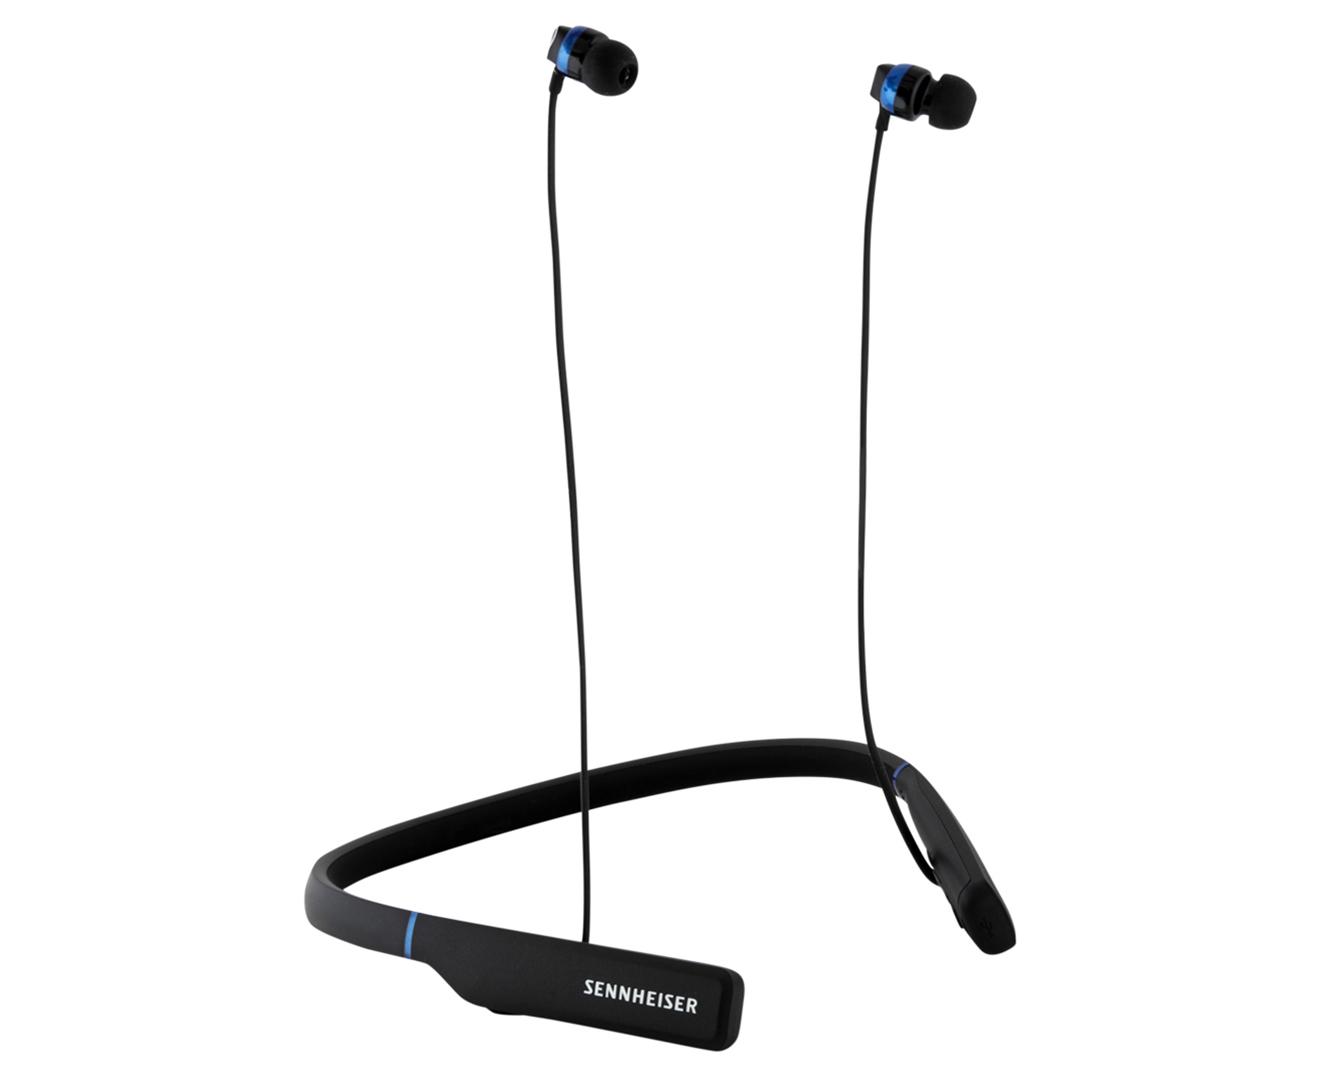 sennheiser cx wireless headphones black groceries online online. Black Bedroom Furniture Sets. Home Design Ideas